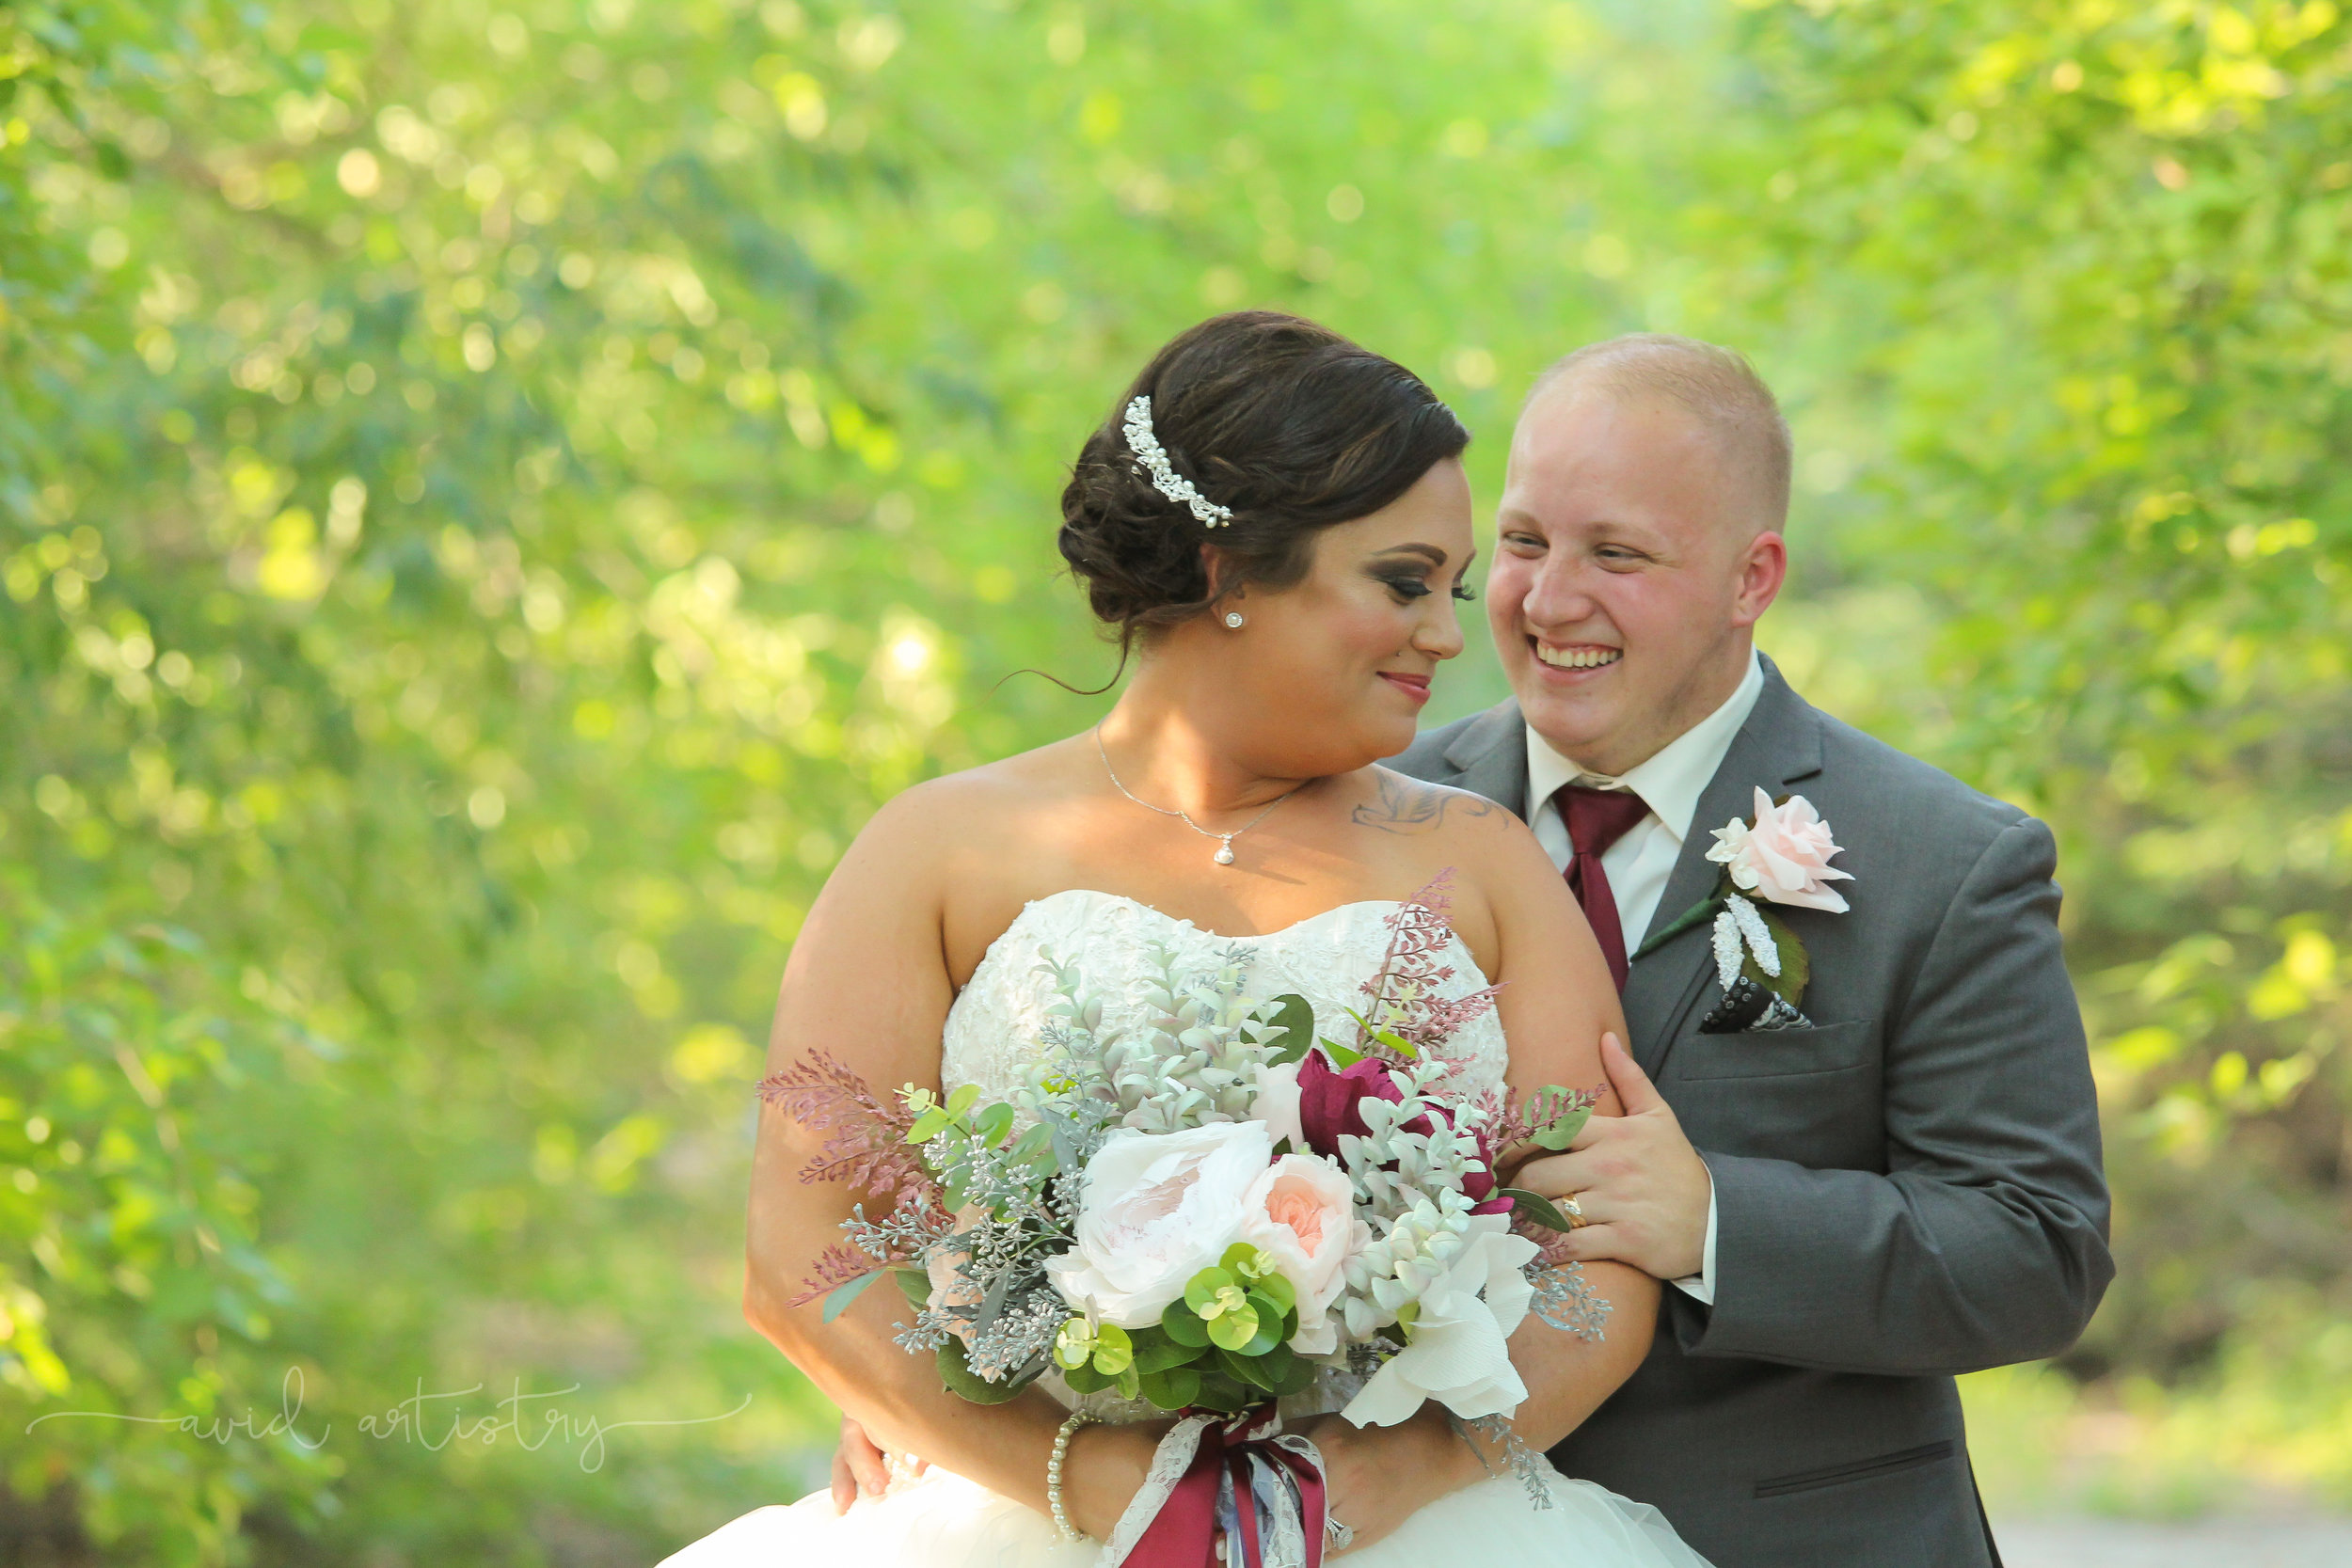 Wedding Photographer, Wichita, Ks. Avid Artistry.